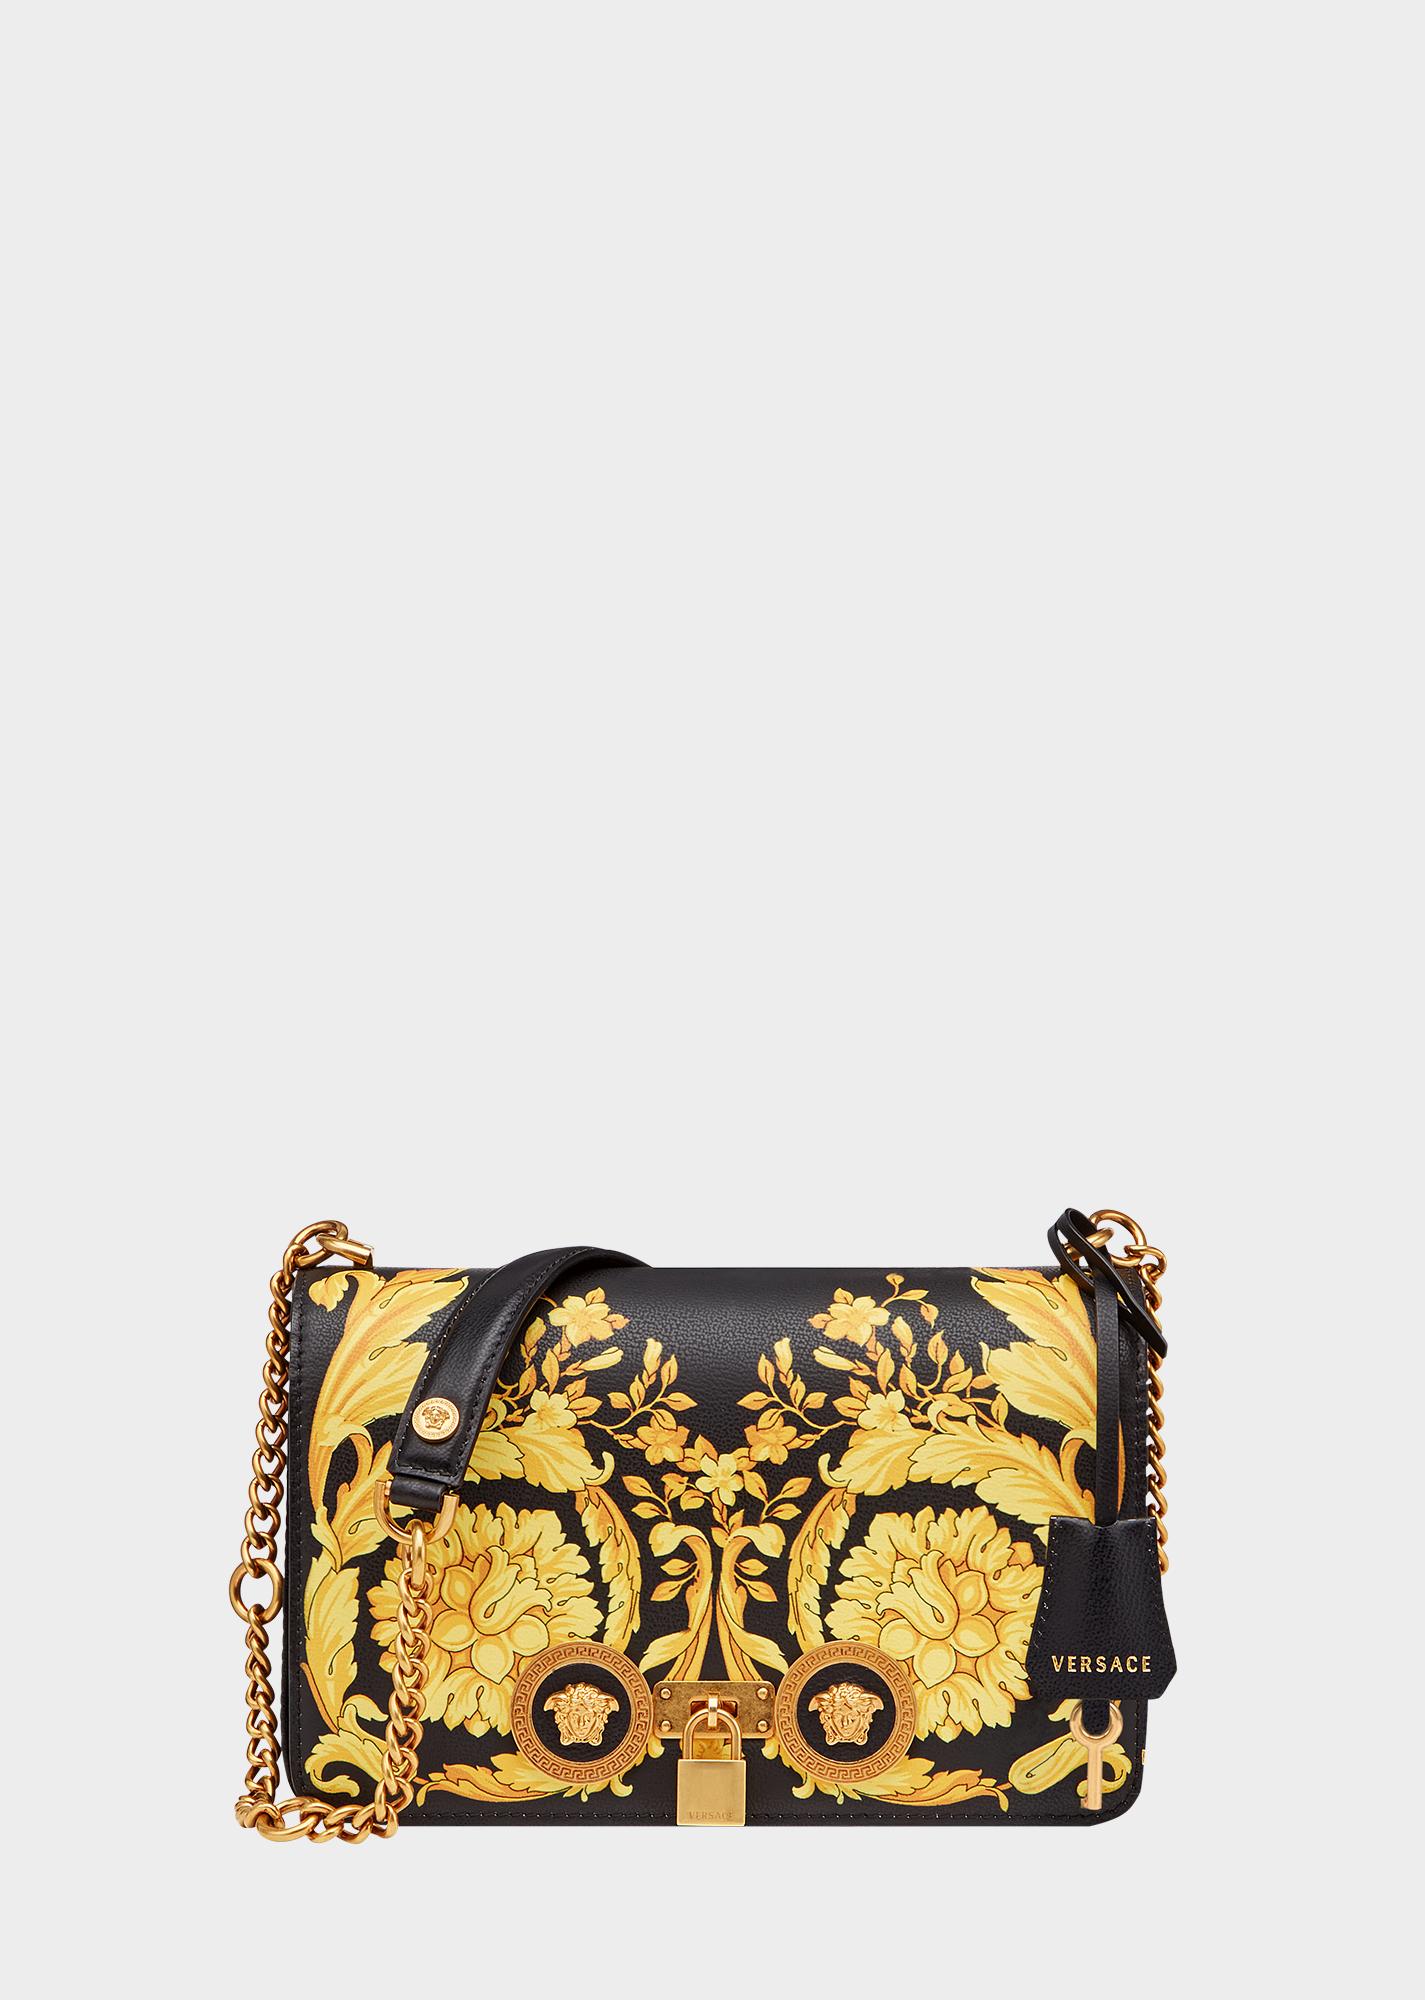 0fed9b181eb4 Barocco Icon Shoulder Bag - Black Gold Shoulder Bags